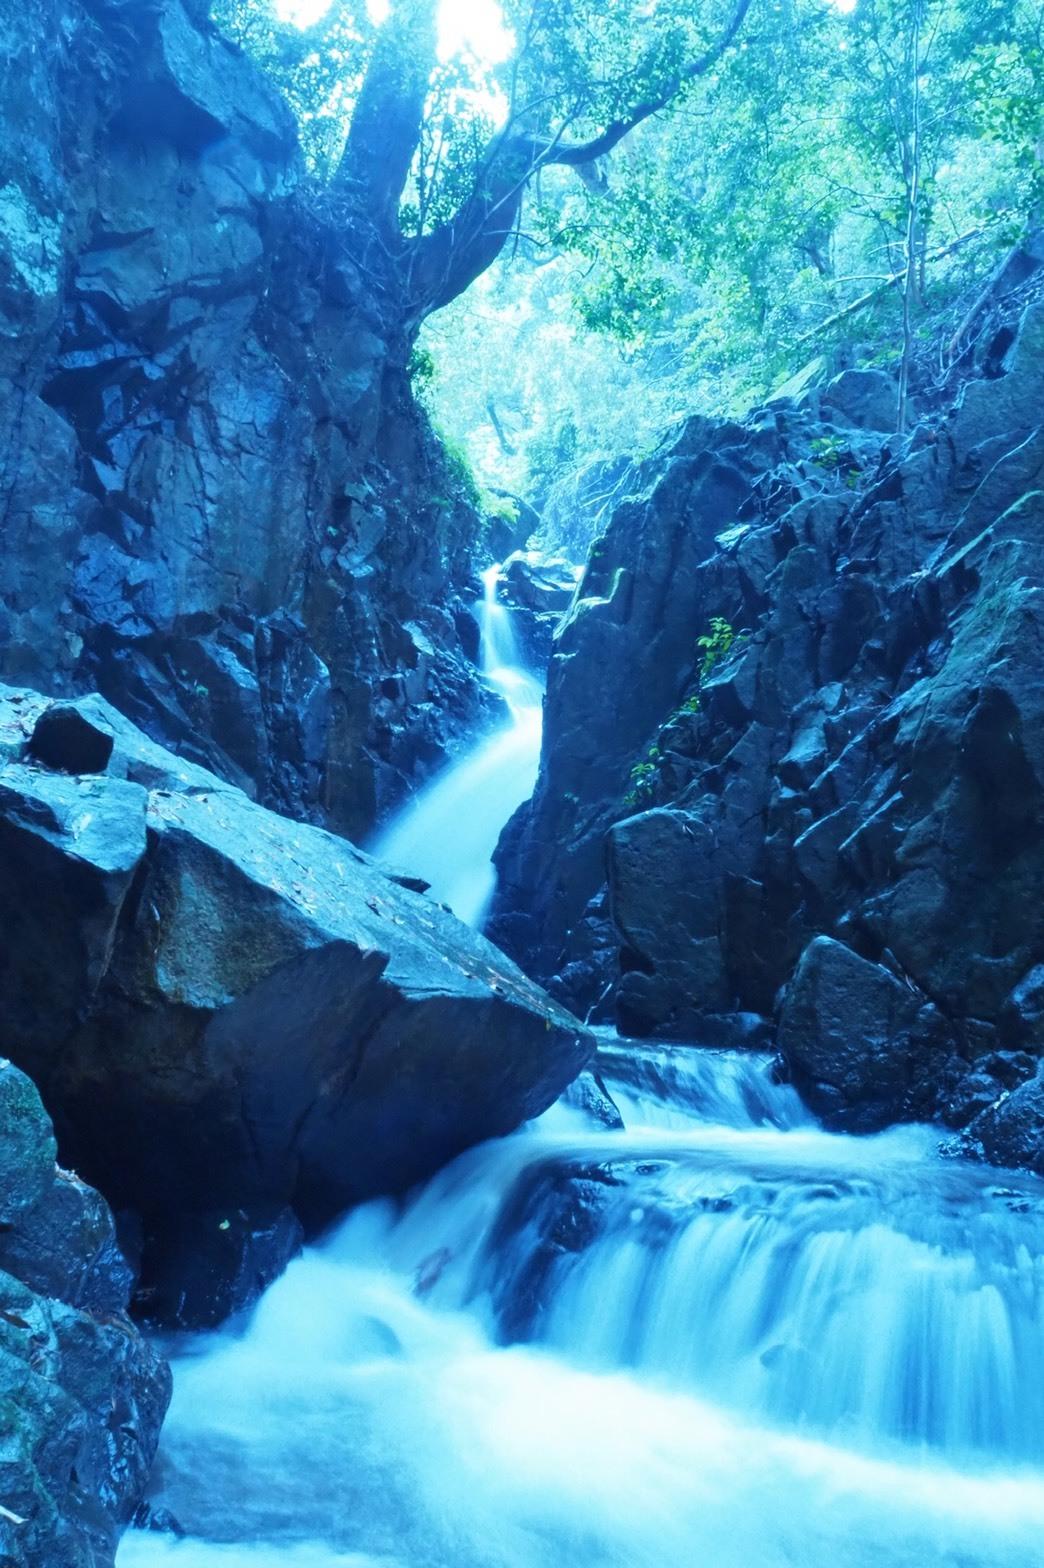 harleydavidson-motorcycle-touring-kyoto-ryuoh-waterfall-2.jpg